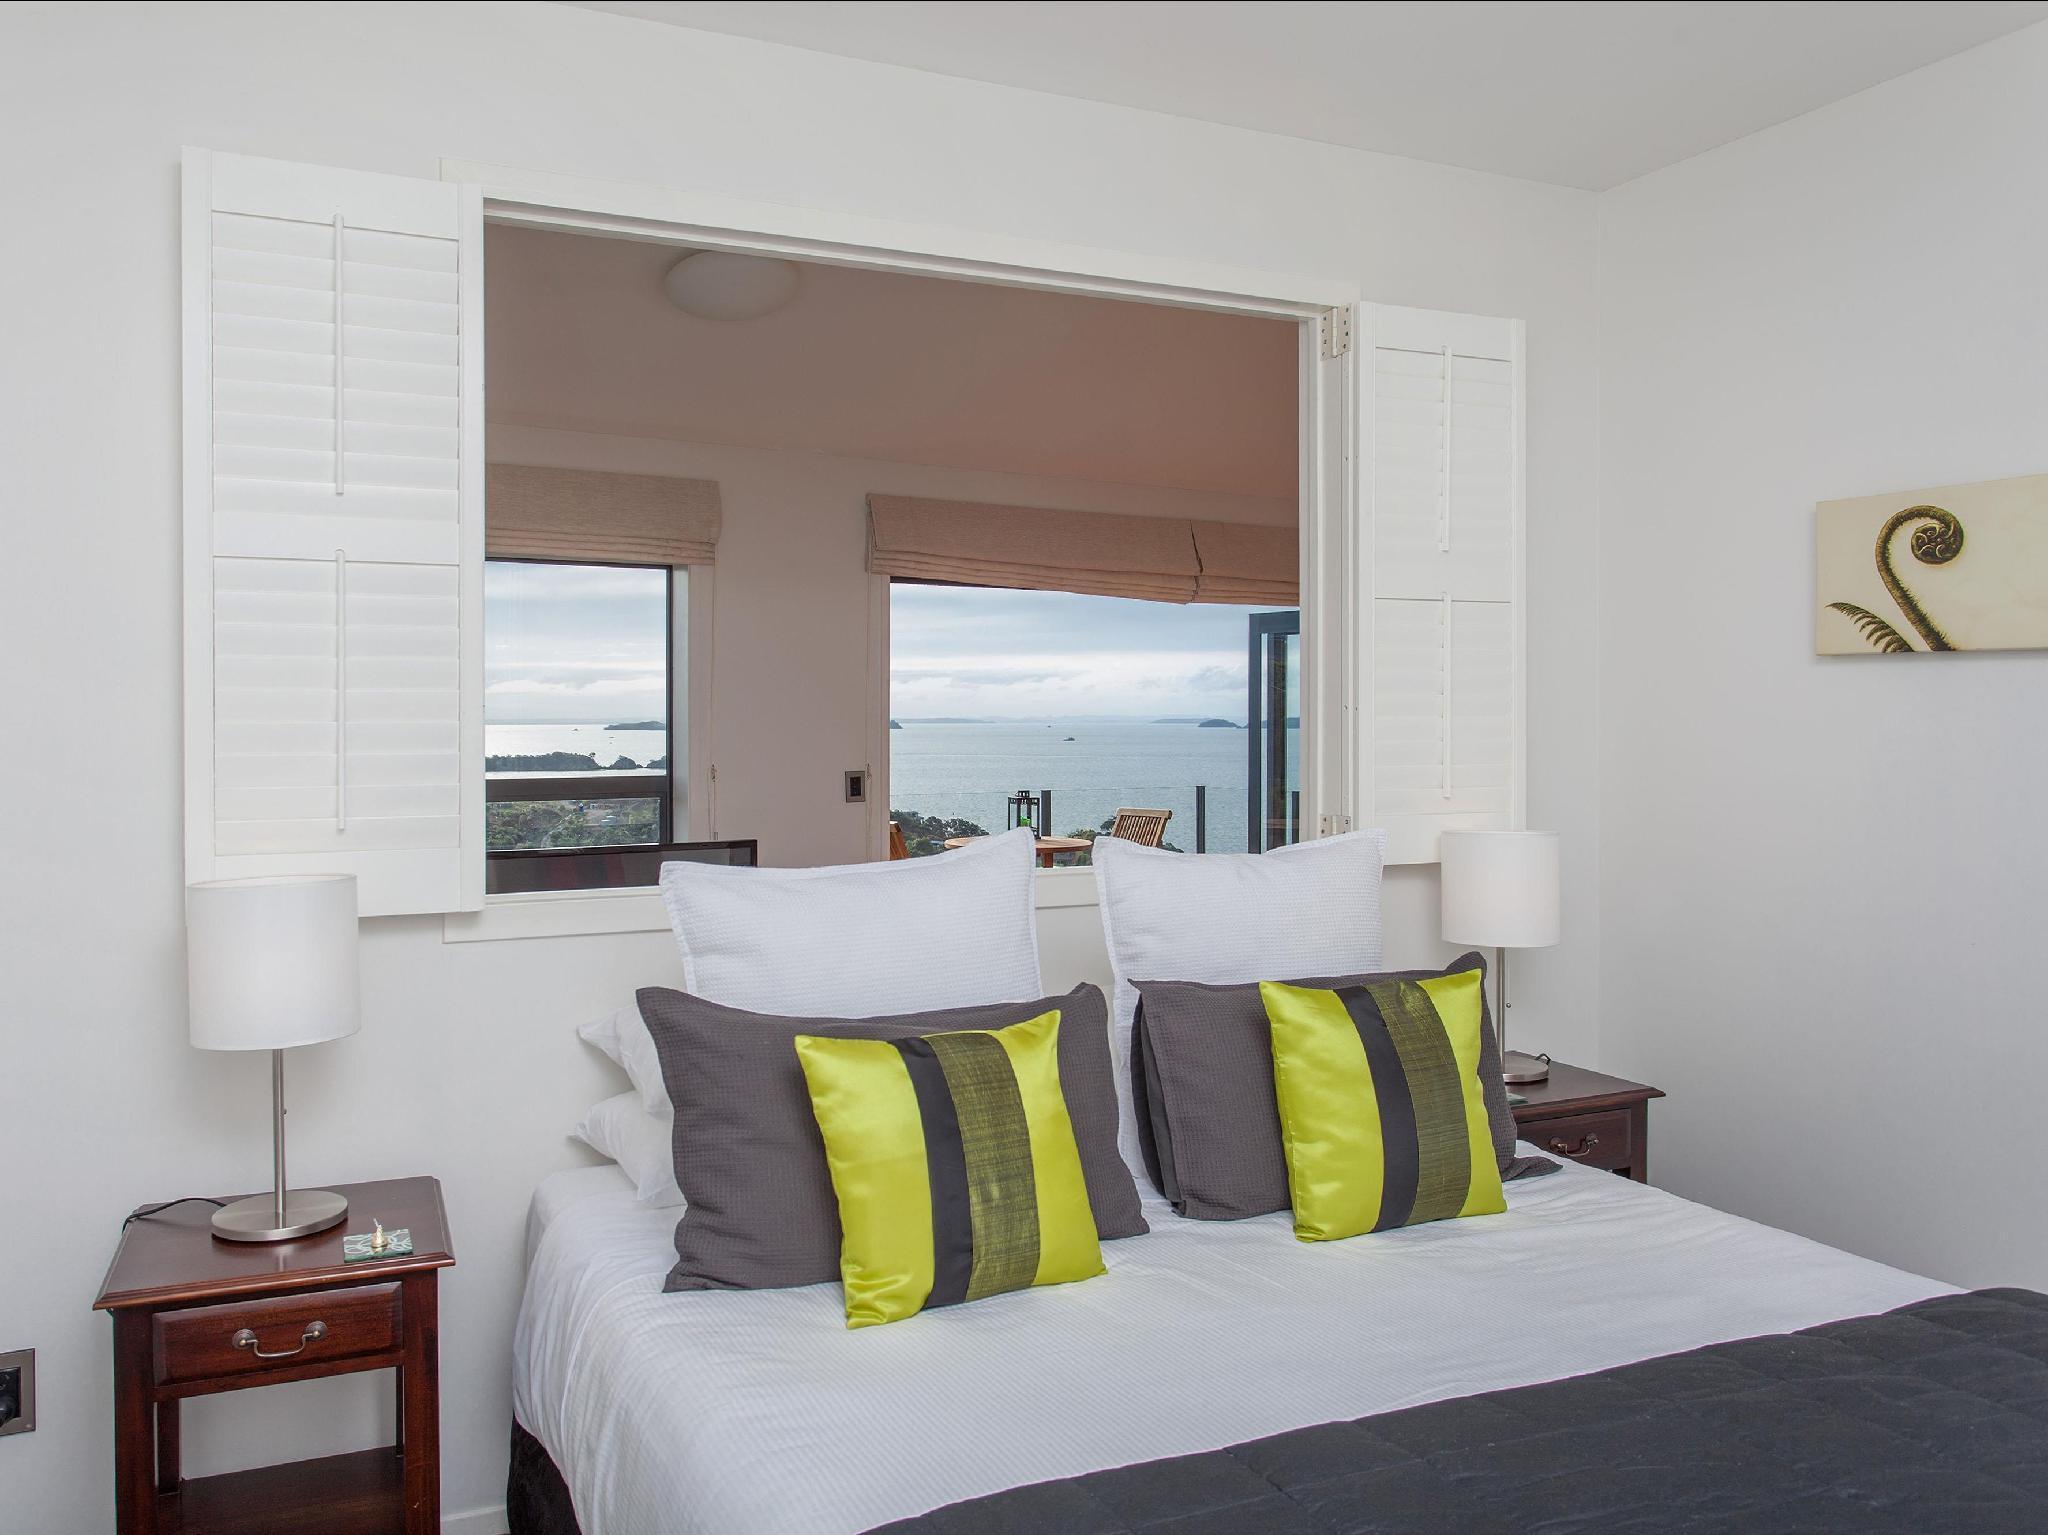 Enclosure Bay Small Hotel, Auckland